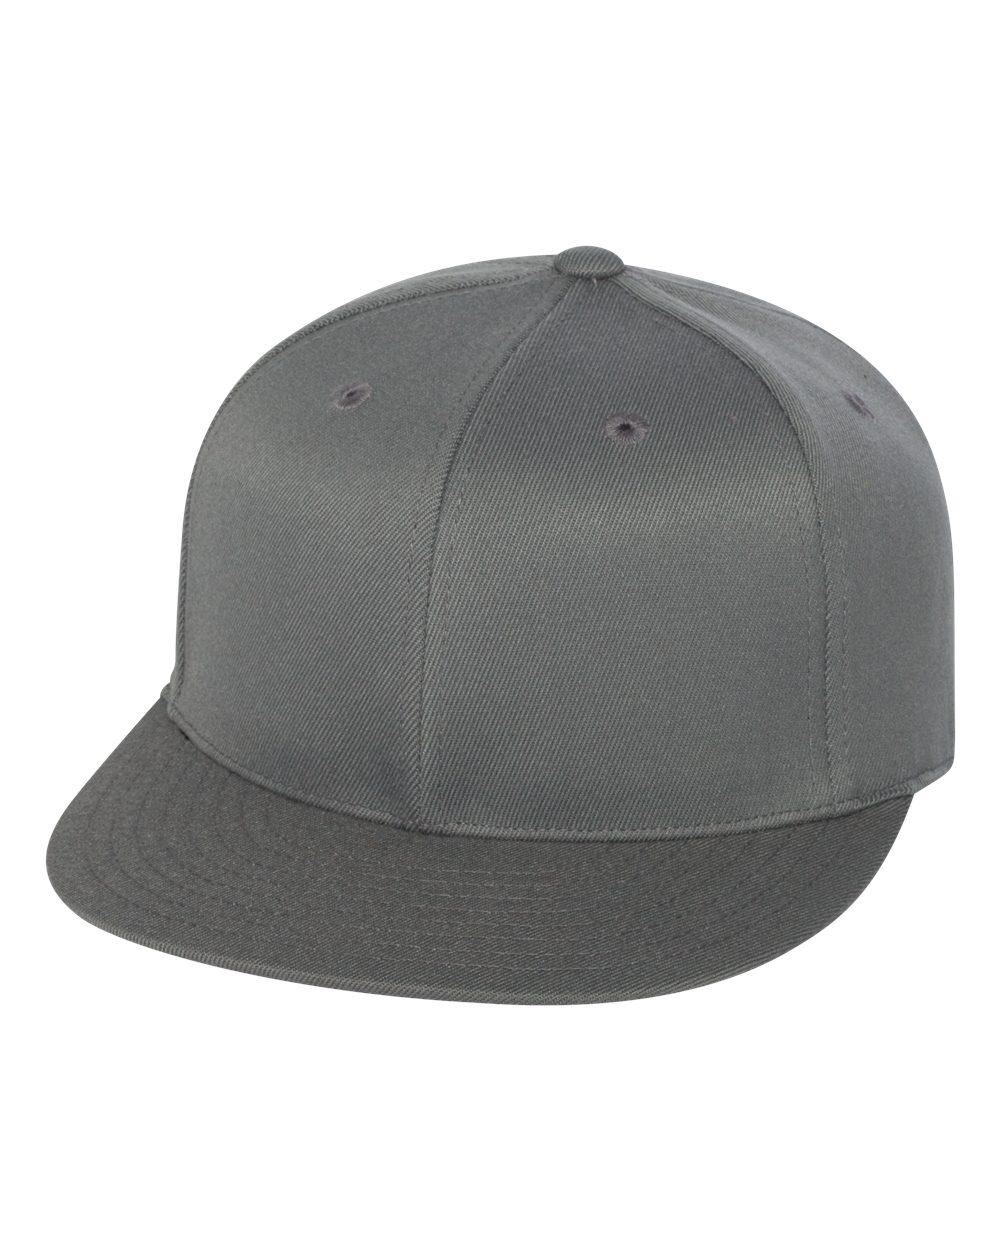 Flexfit 6210FF - Flat Bill Cap